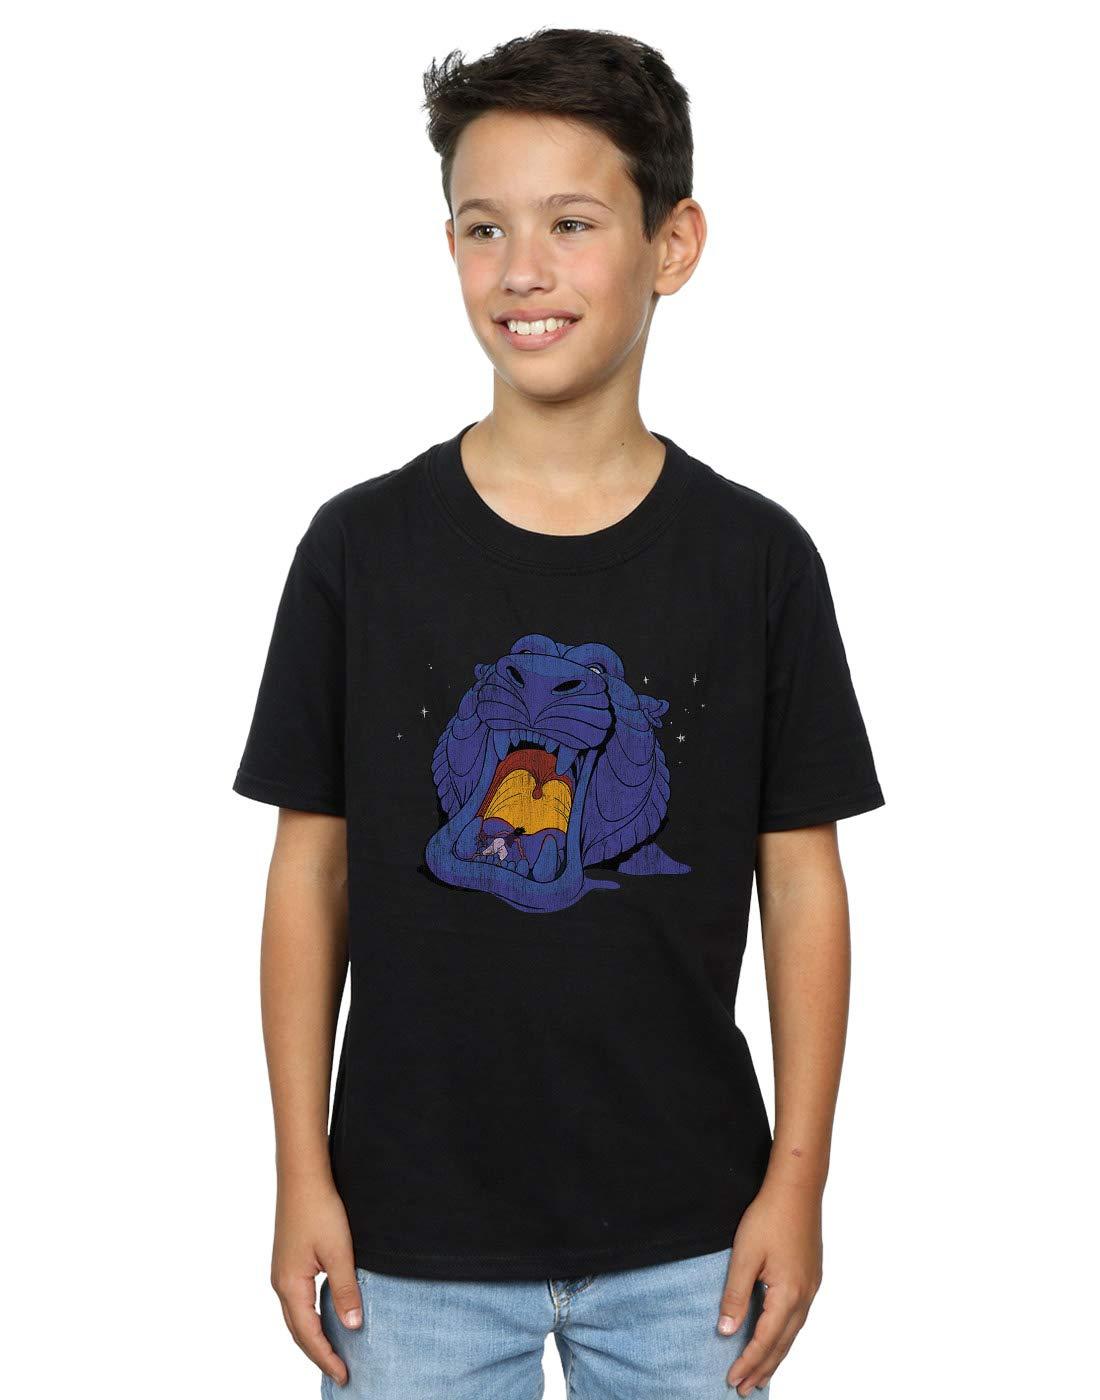 Disney Aladdin Cave Of Wonders Distressed Tshirt